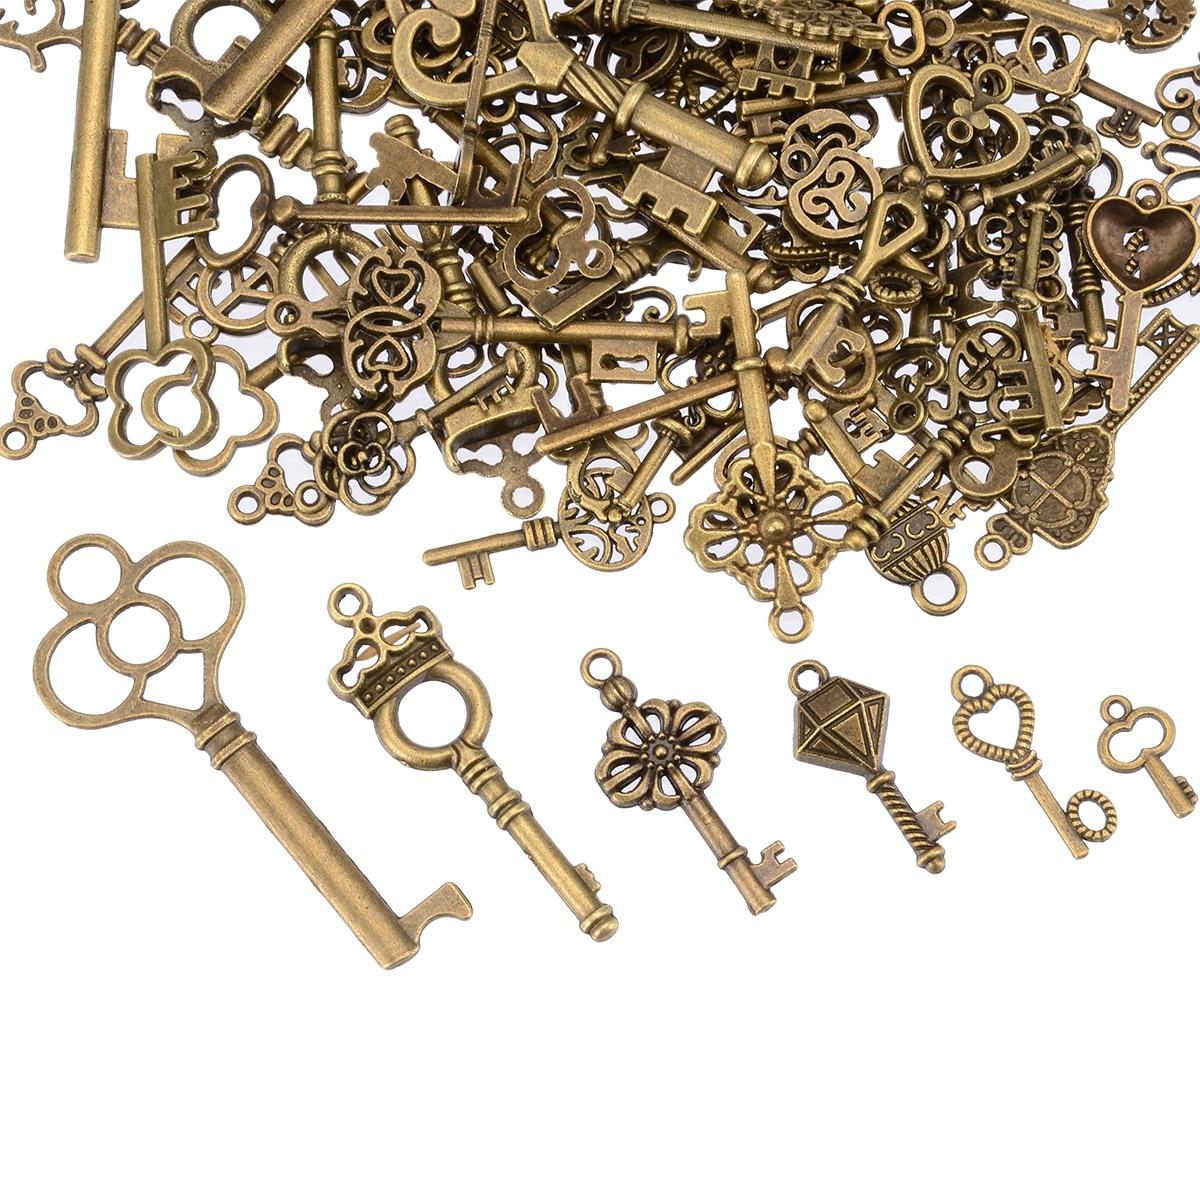 New 125pcs/set Antique Vintage Old Look Bronze Skeleton Keys Present Fancy Heart Bow Party Supplies DIY Jewerly Pendant Decor